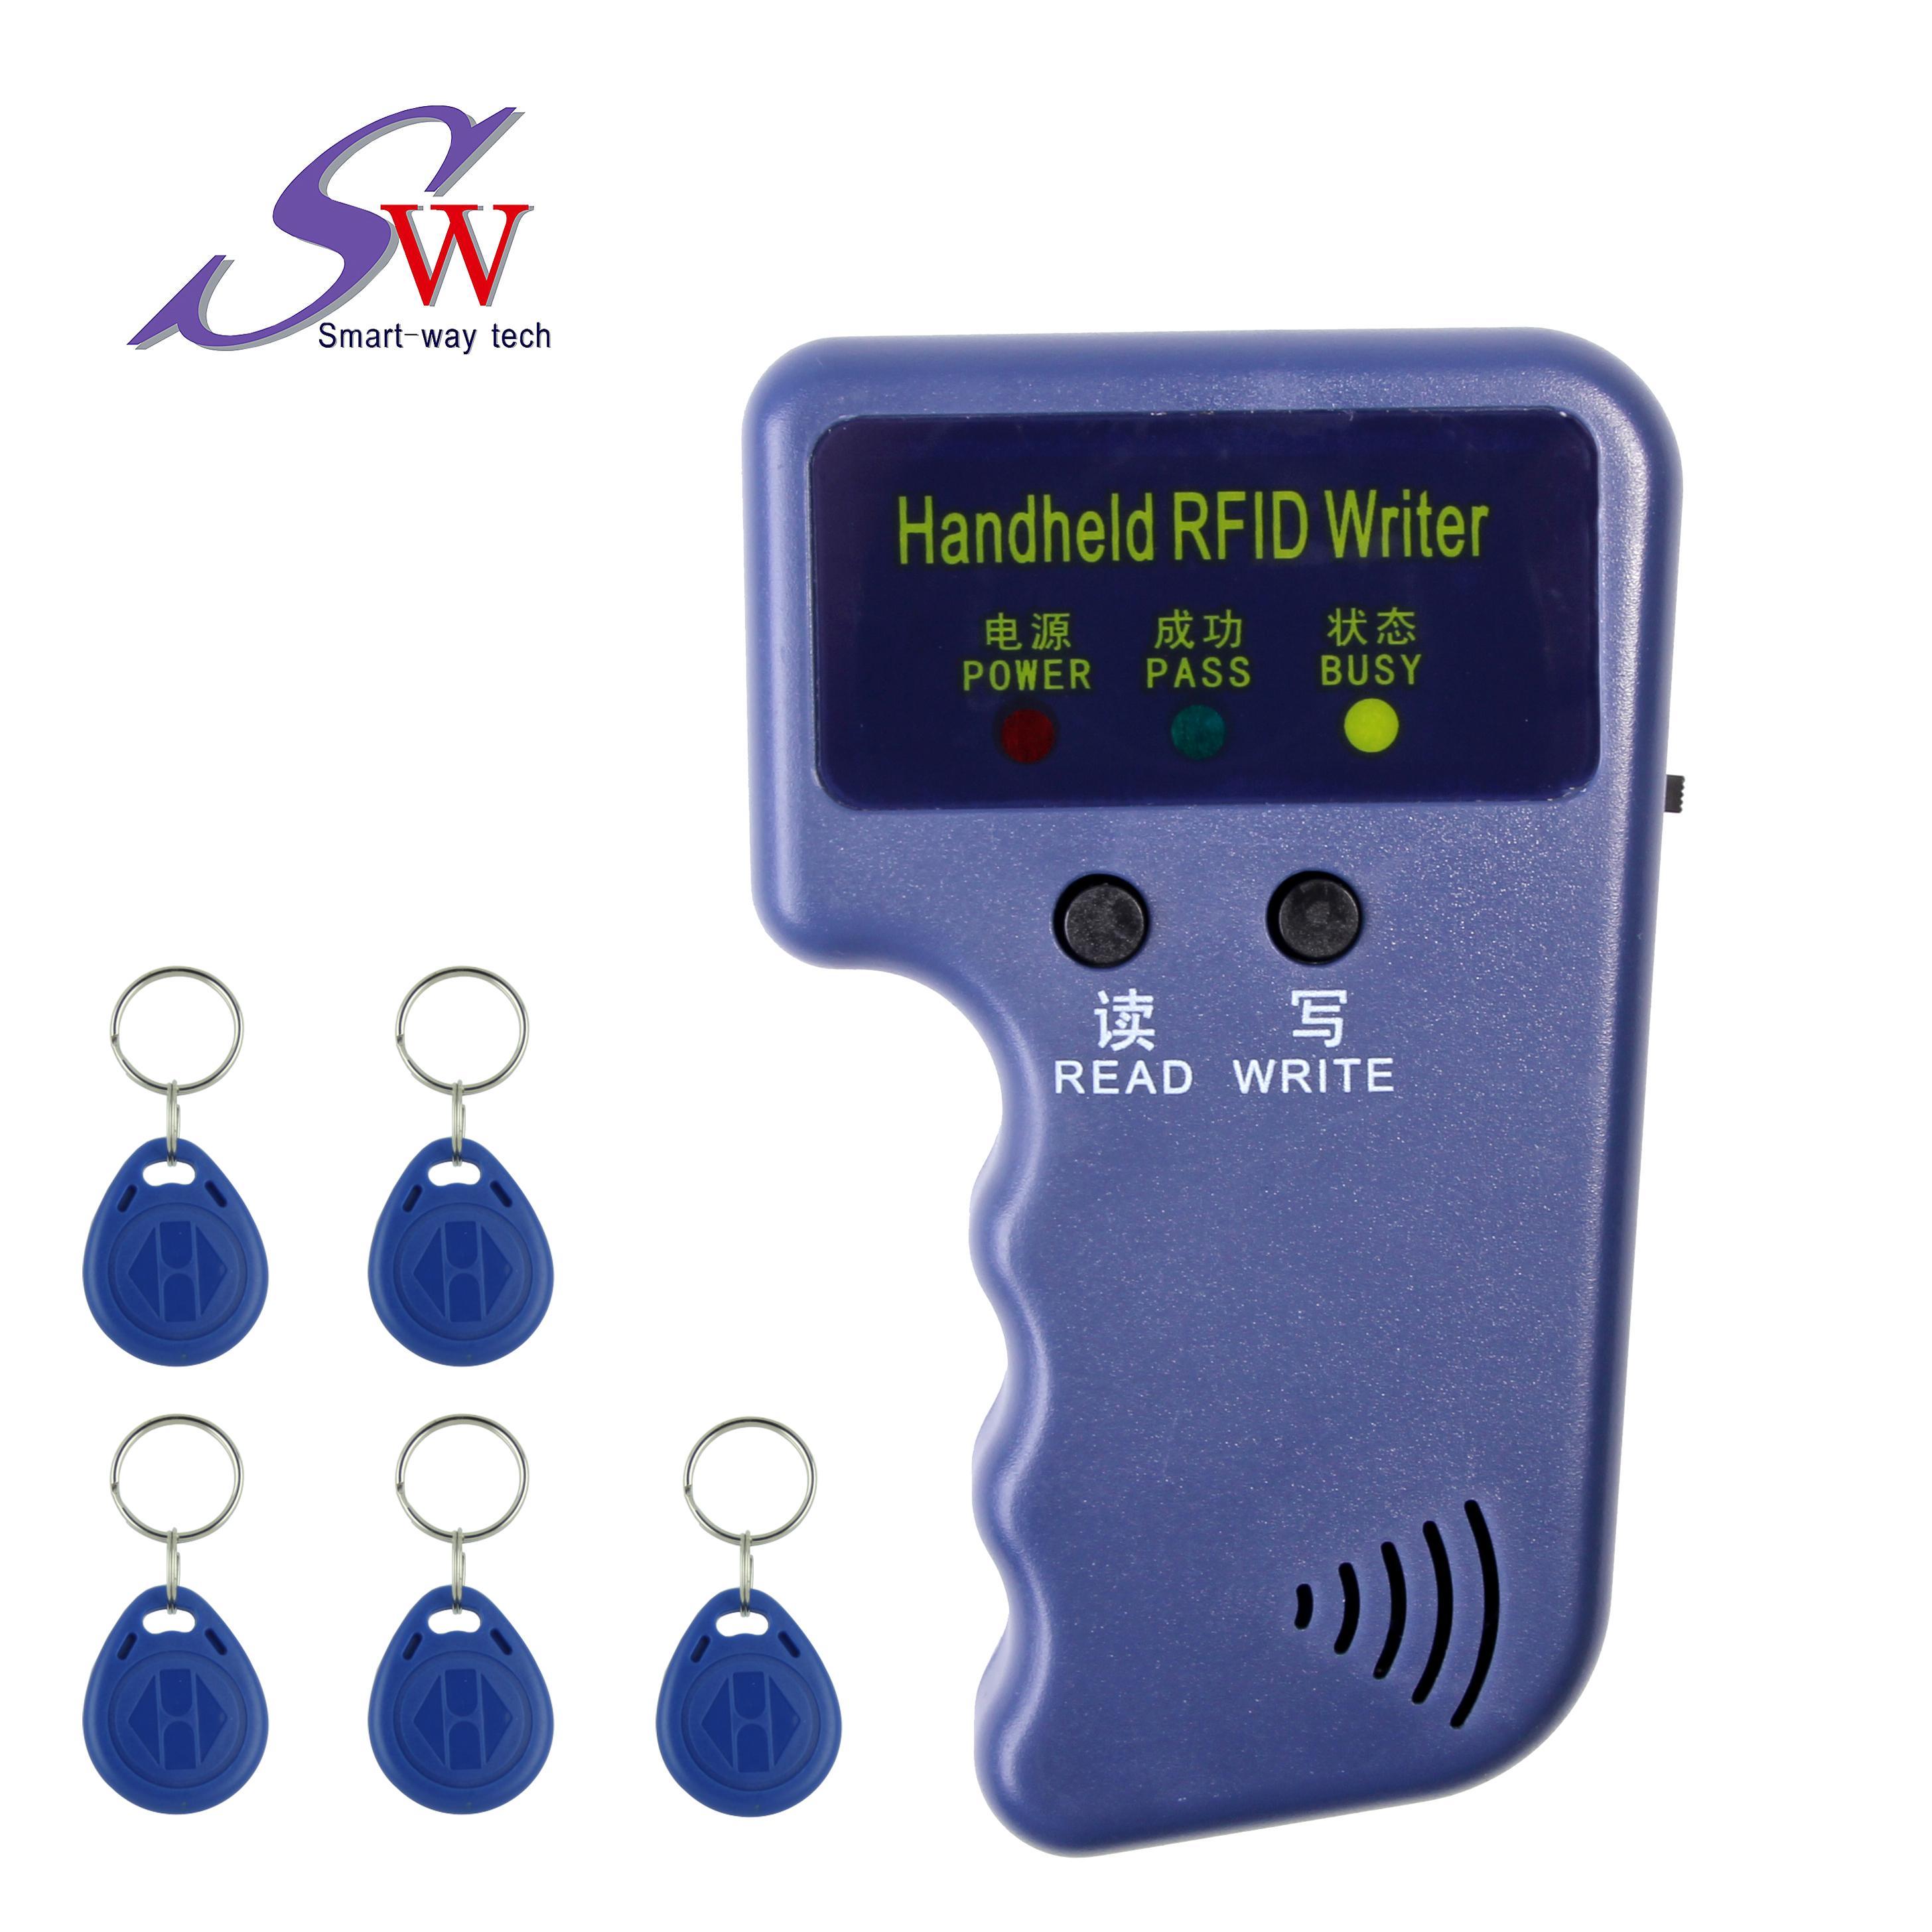 RFID duplicatore Handheld 125KHZ ID Card Copier scrittore + 5pcs T5577 riscrivibili abs blu carte portachiavi anche possibile utilizzare carta EM4305 chip